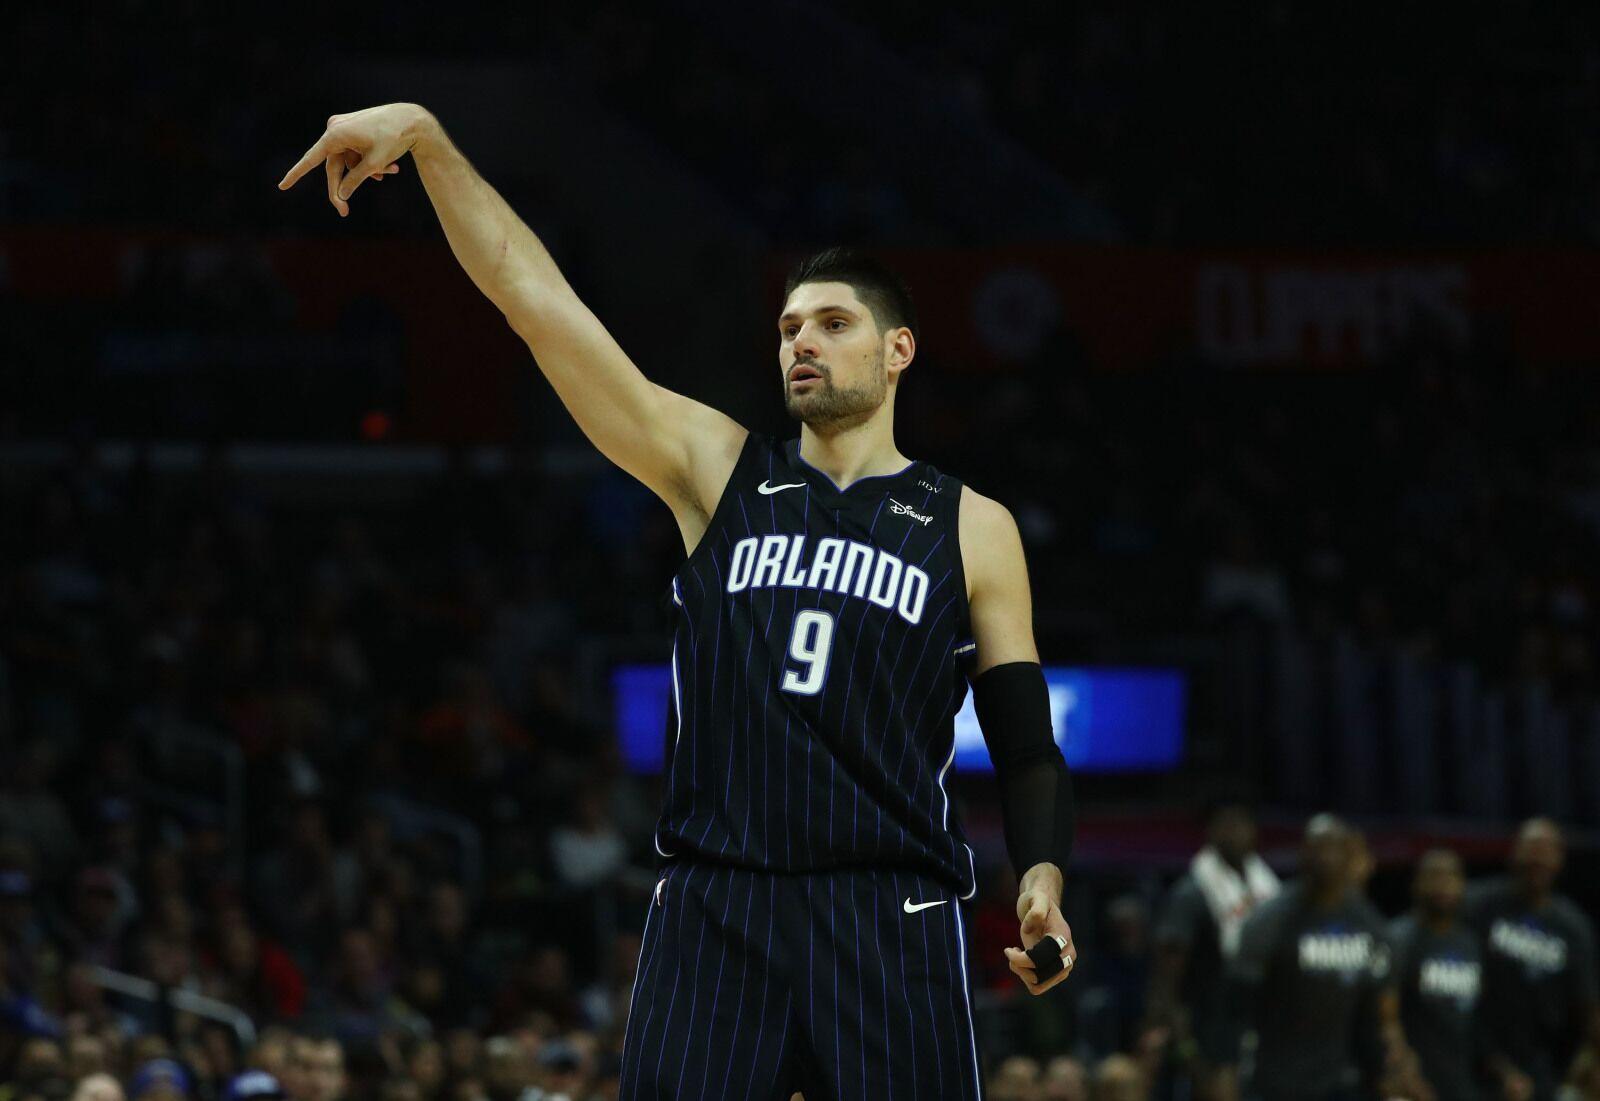 2017-18 Orlando Magic Player Evaluations: Nikola Vucevic